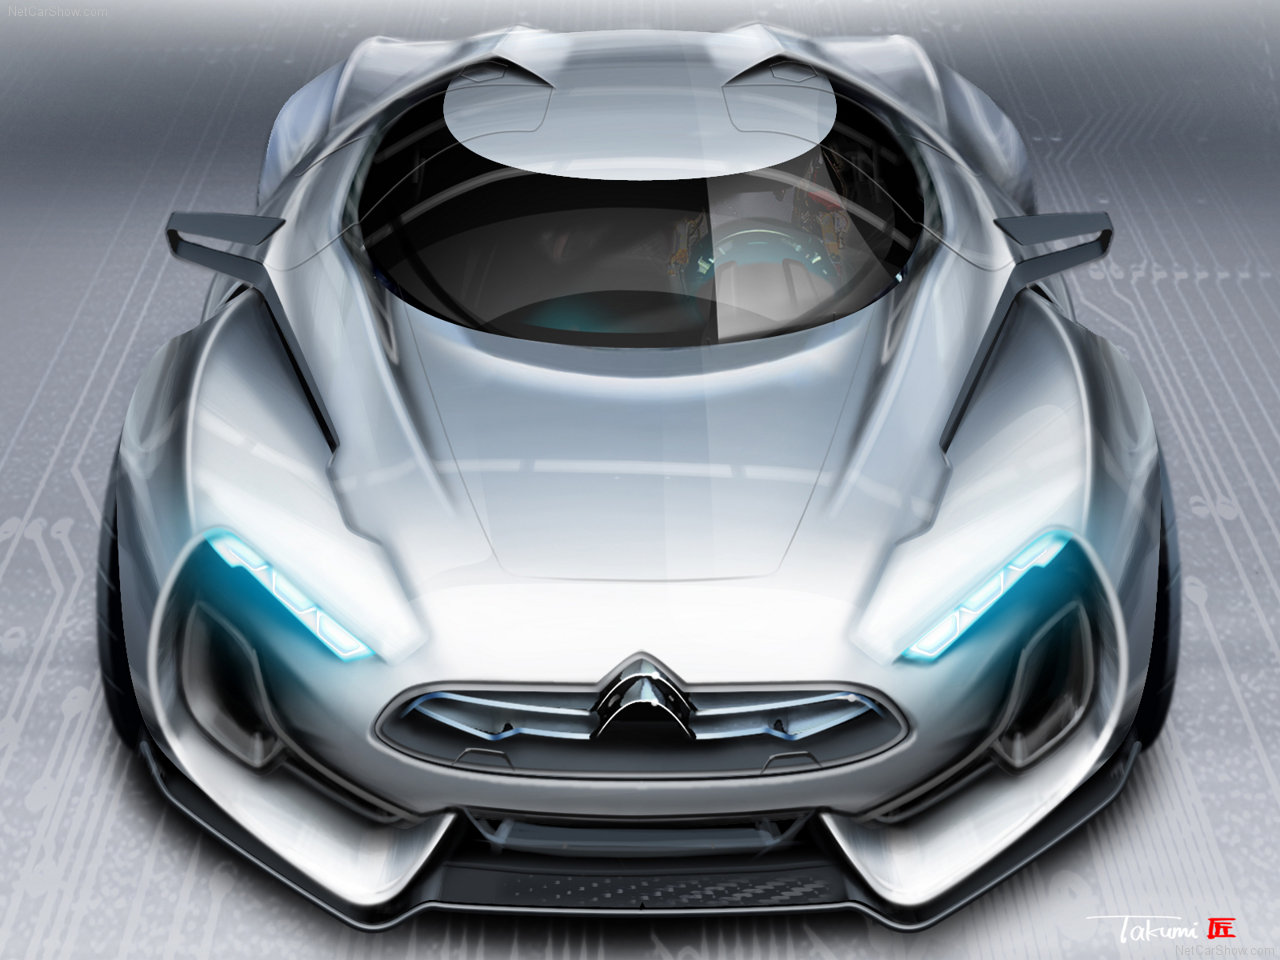 sketchsite: car sketch